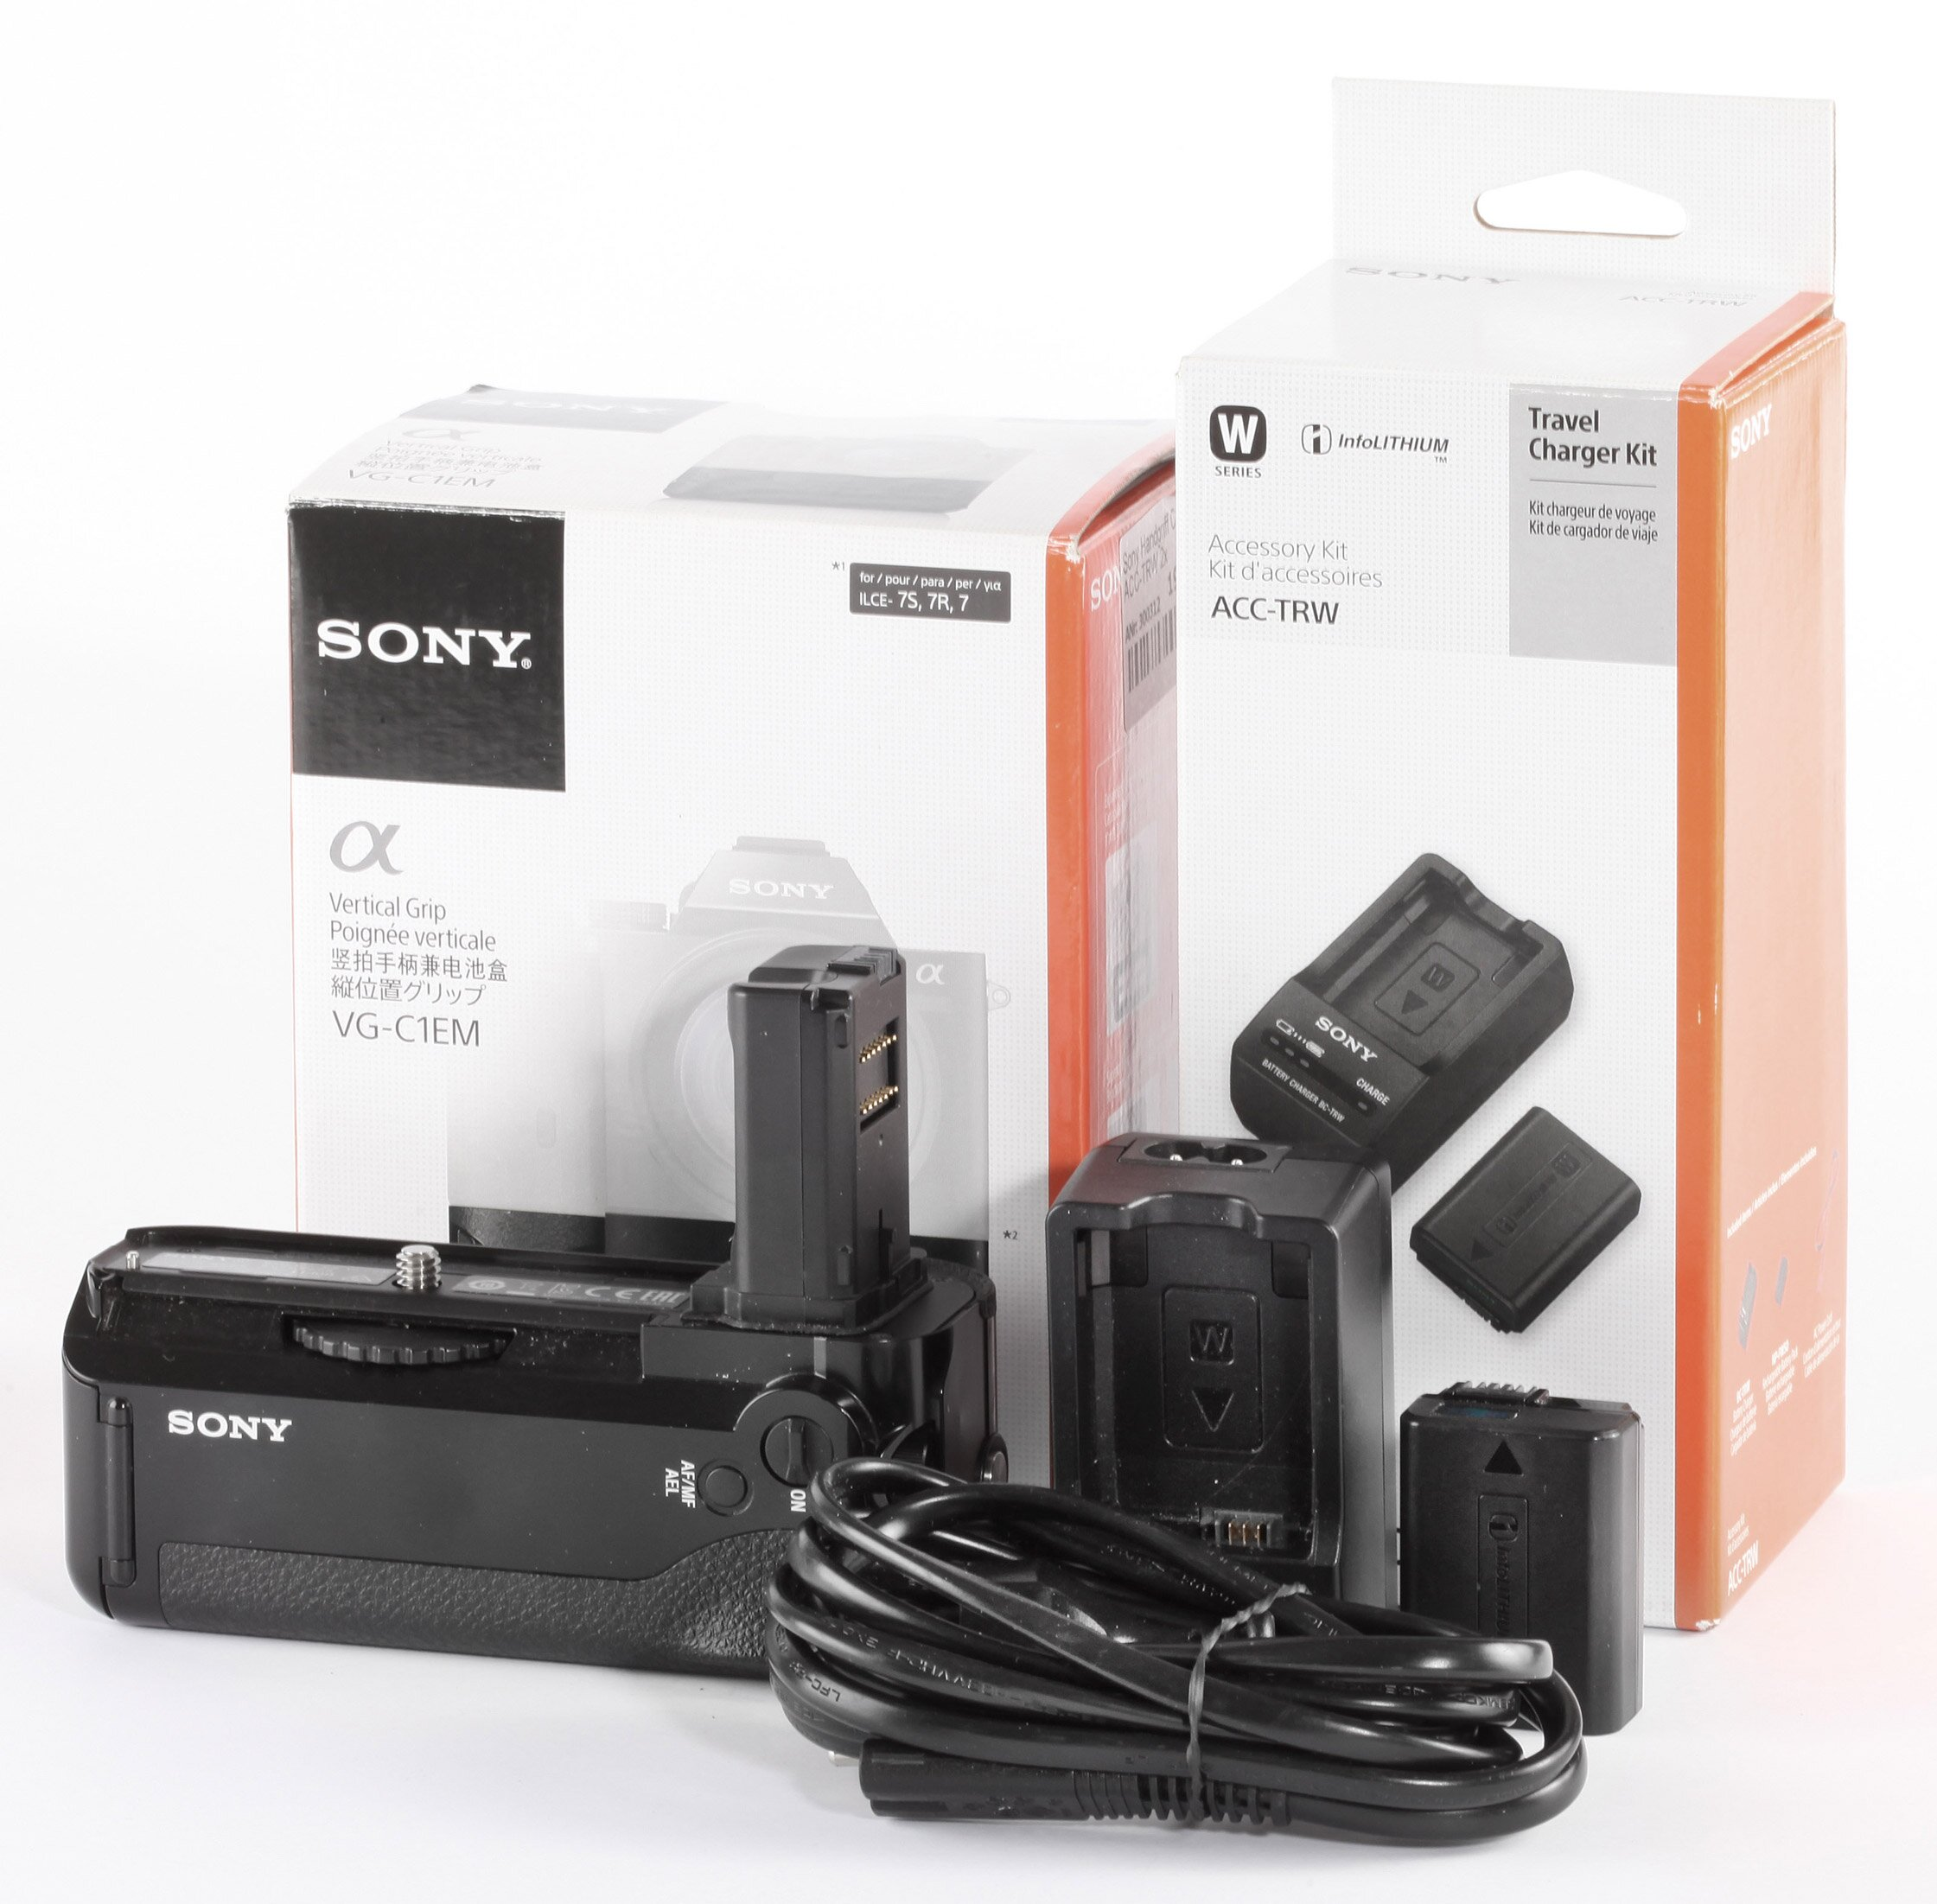 Sony Handgriff C1EM + ACC-TRW 2x